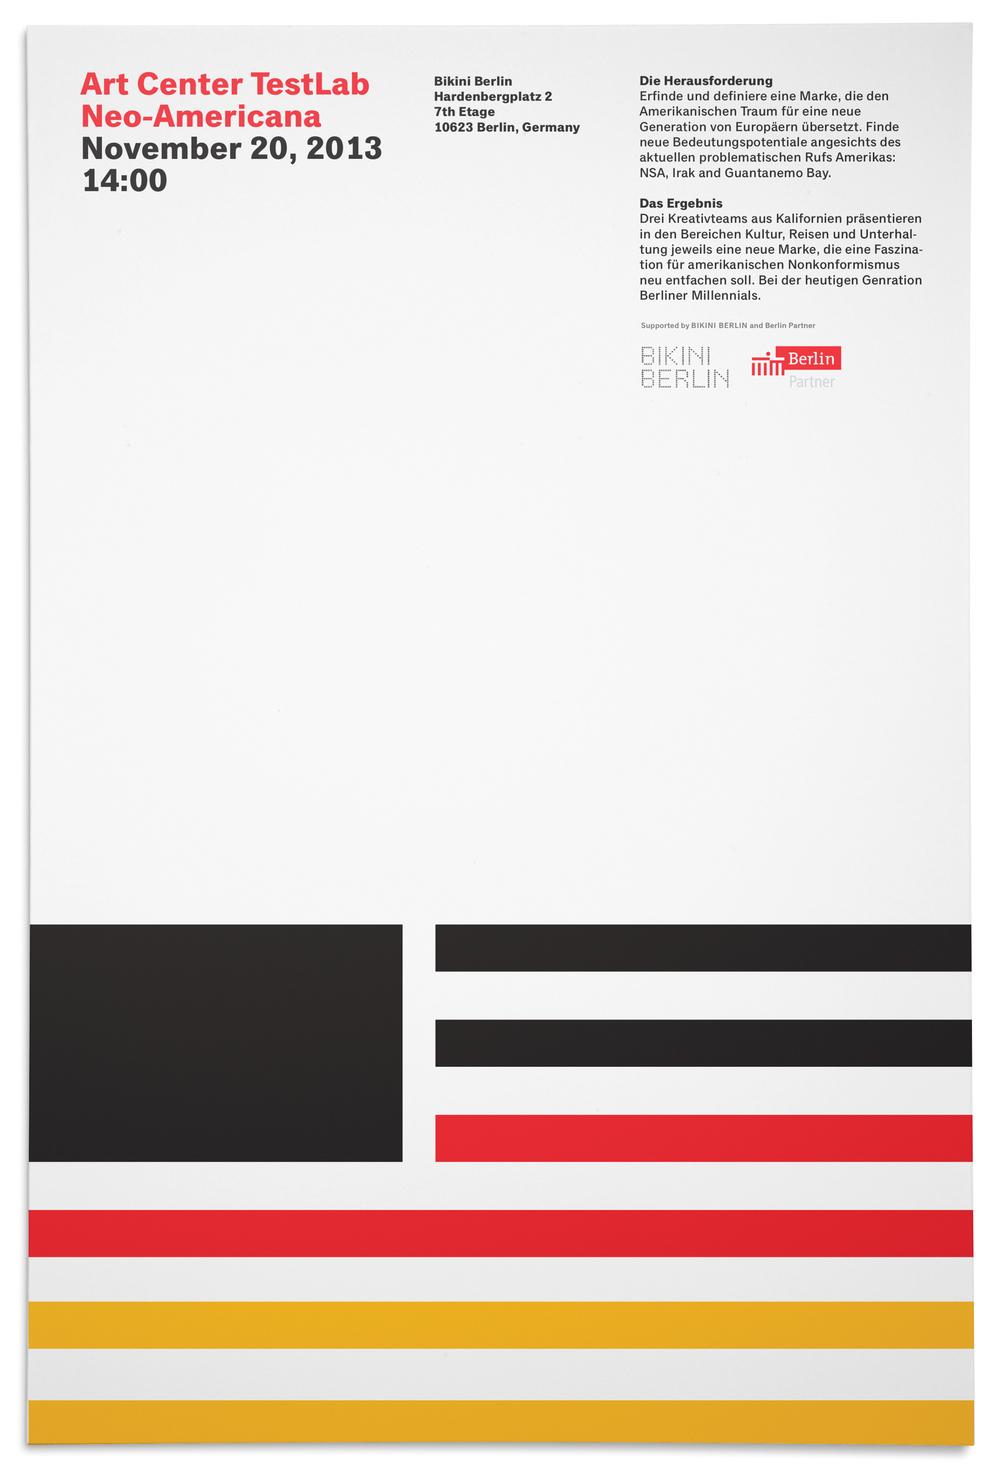 ArtCenterBerlin_poster.jpg